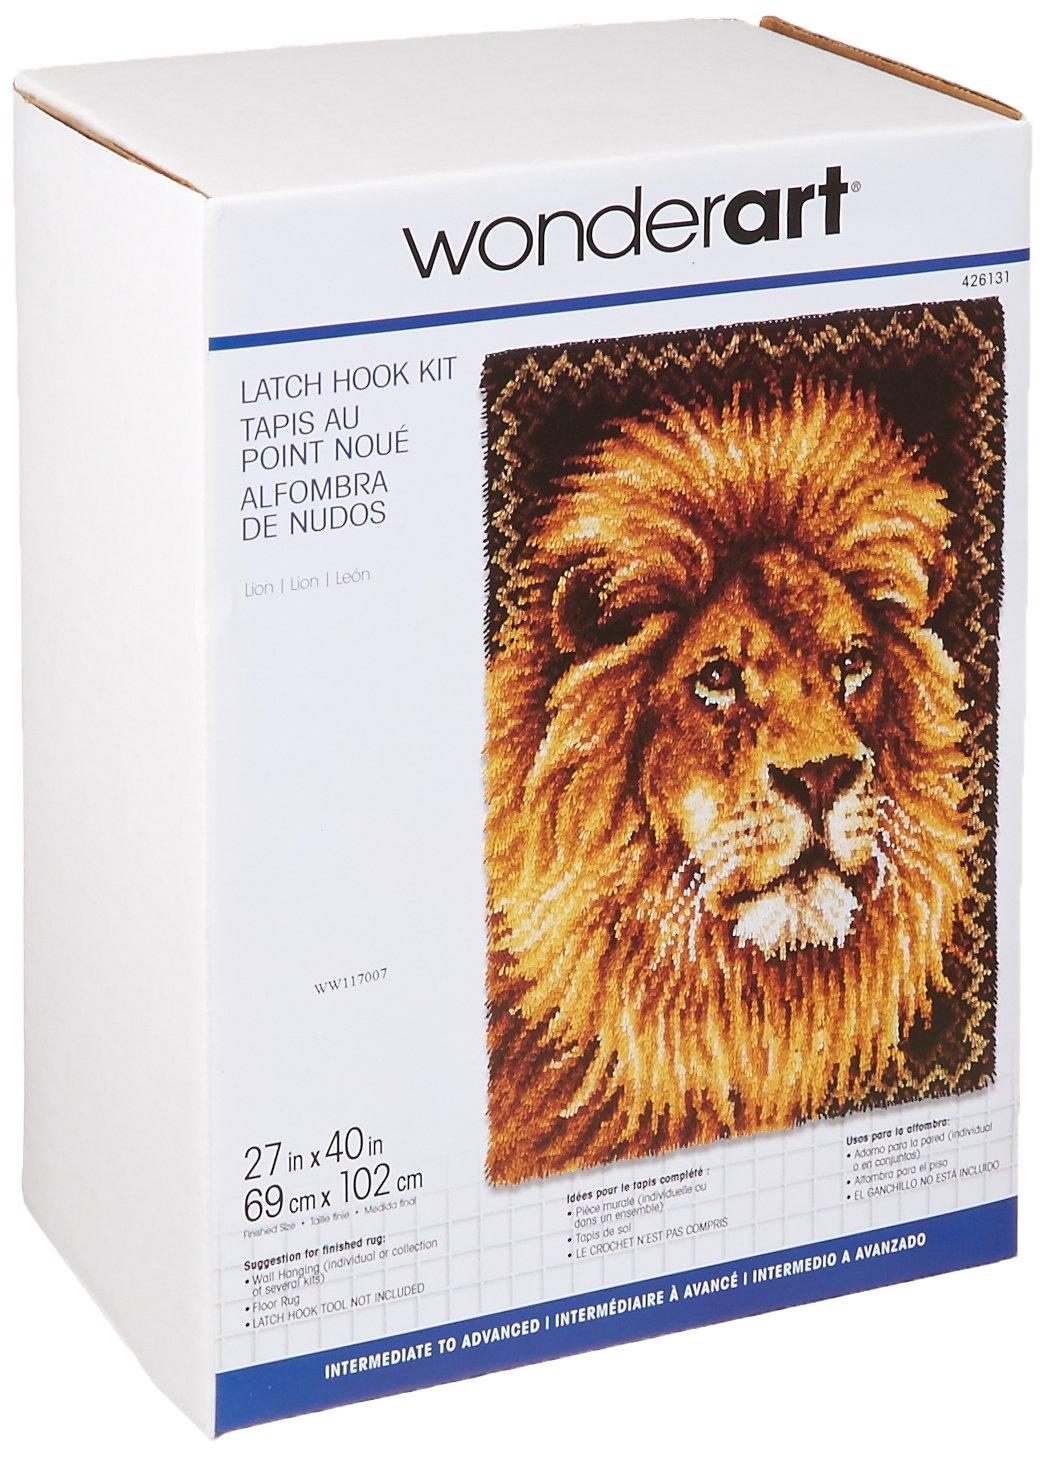 Wonderart Lion Latch Hook Kit, 27